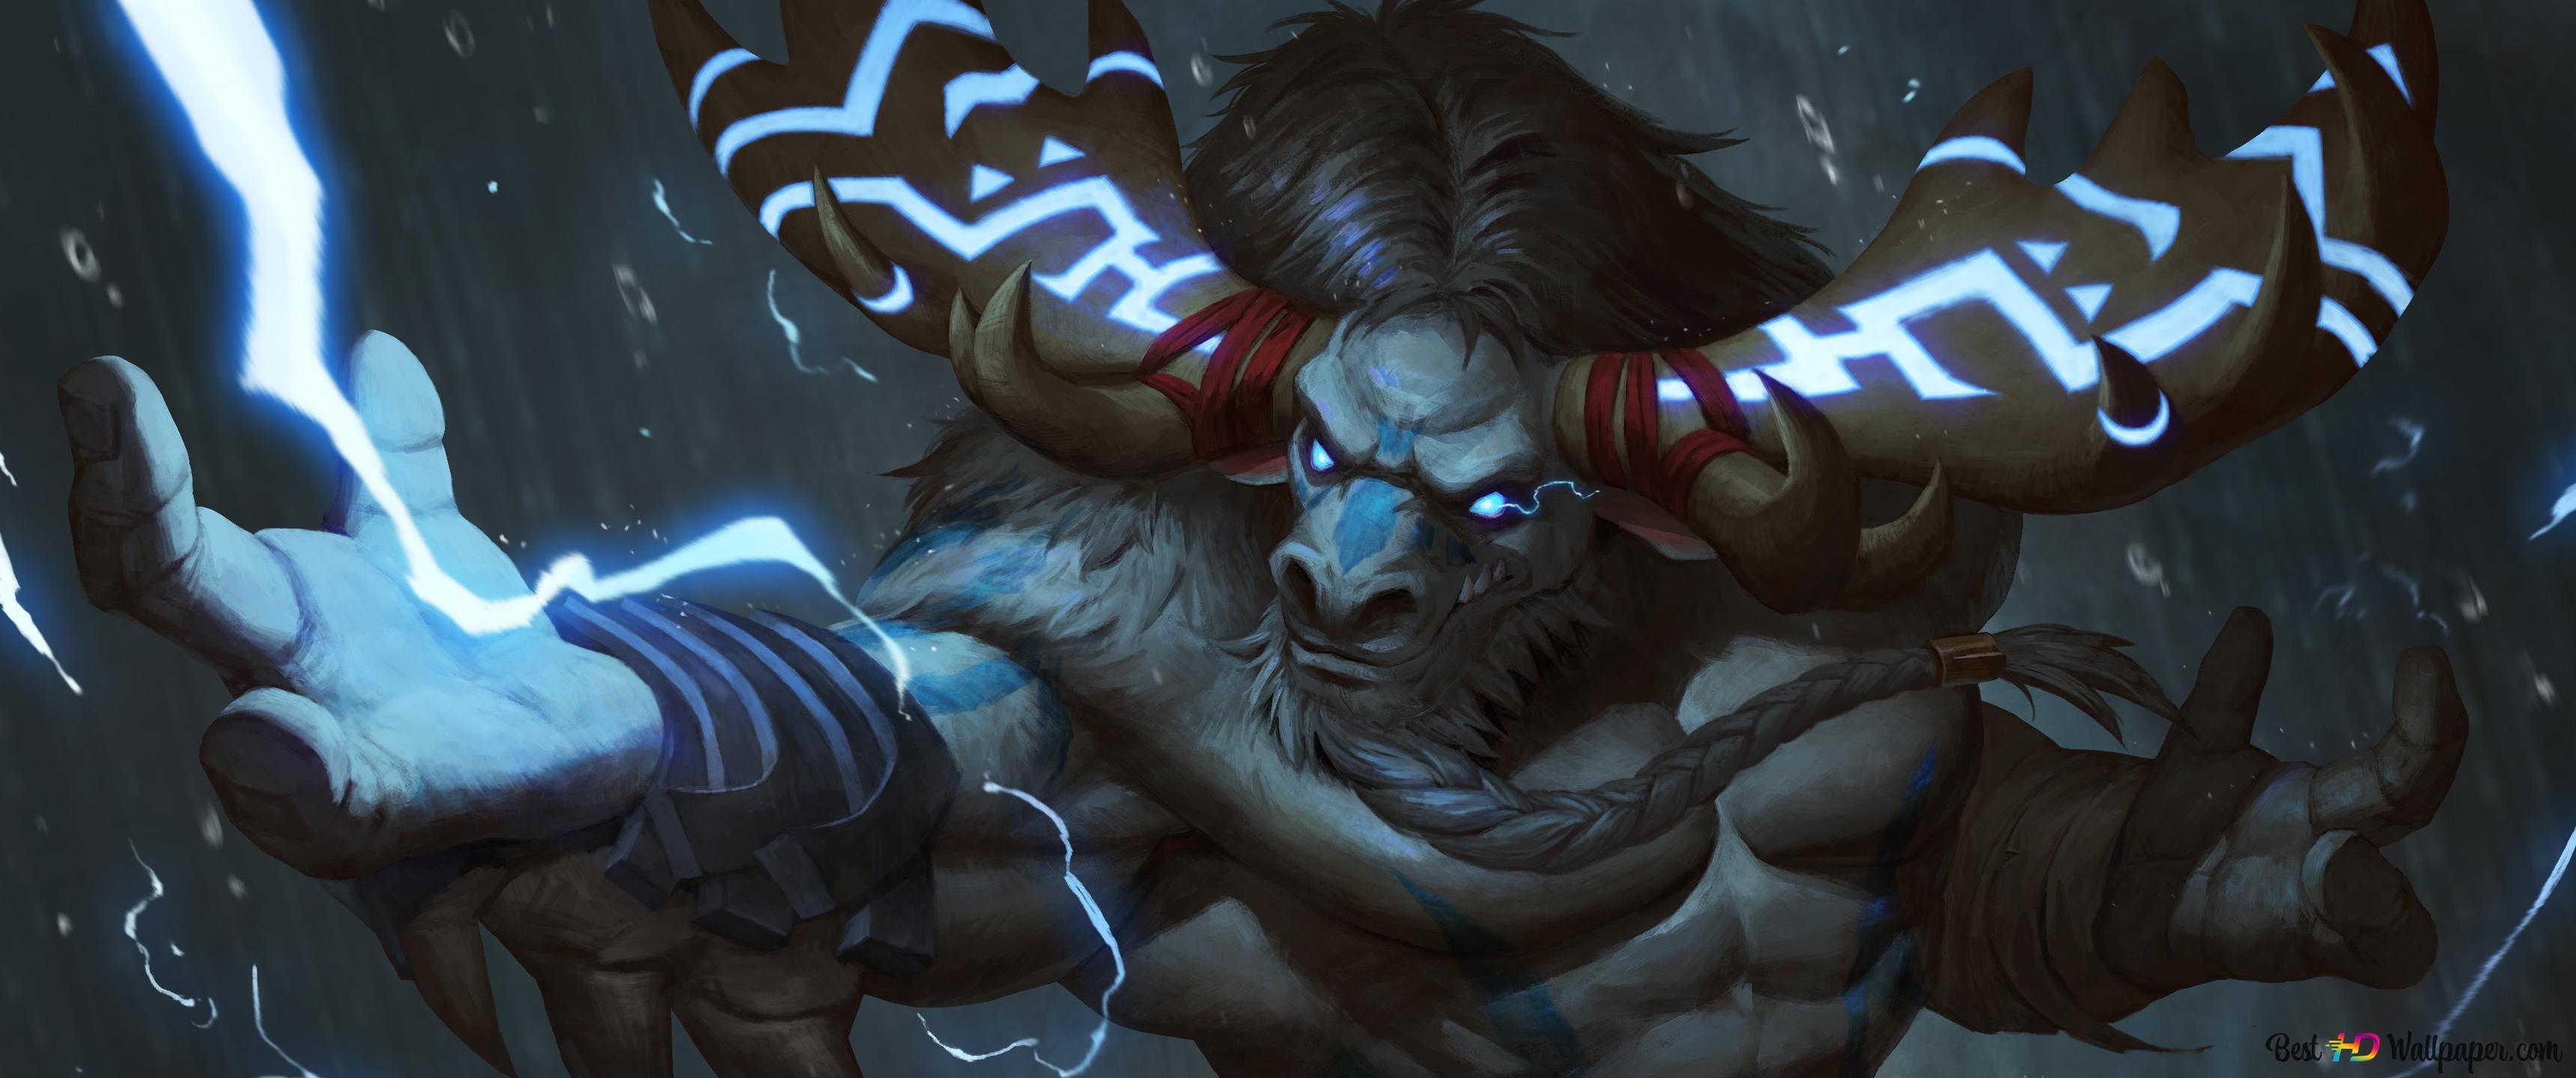 World Of Warcraft Tauren Hd Wallpaper Download